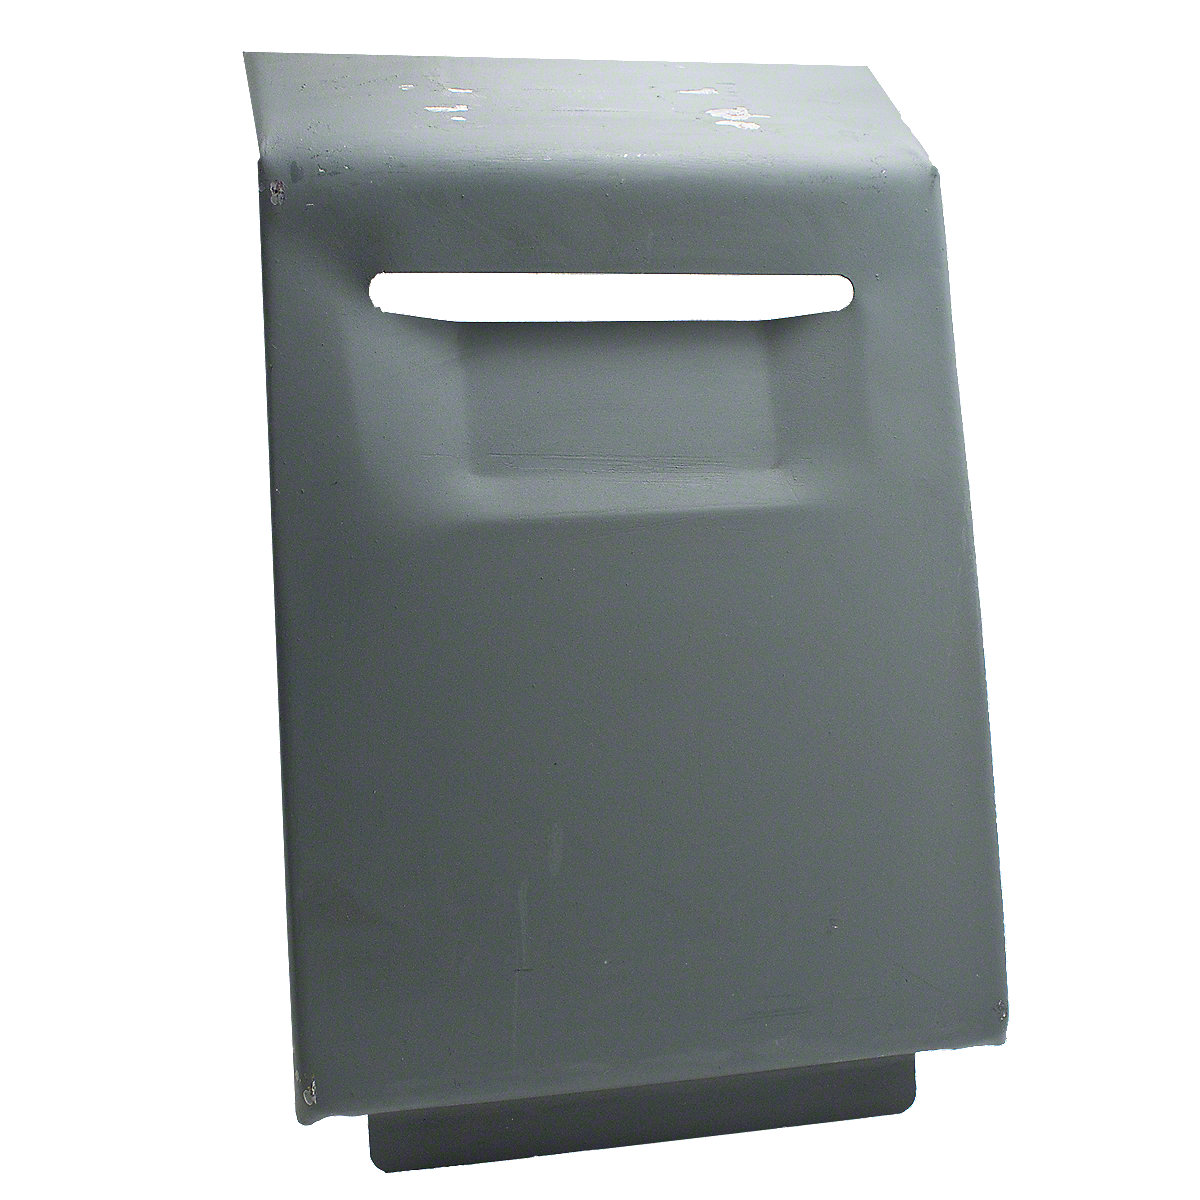 Battery Door For Massey Ferguson: 150, 165, 175.